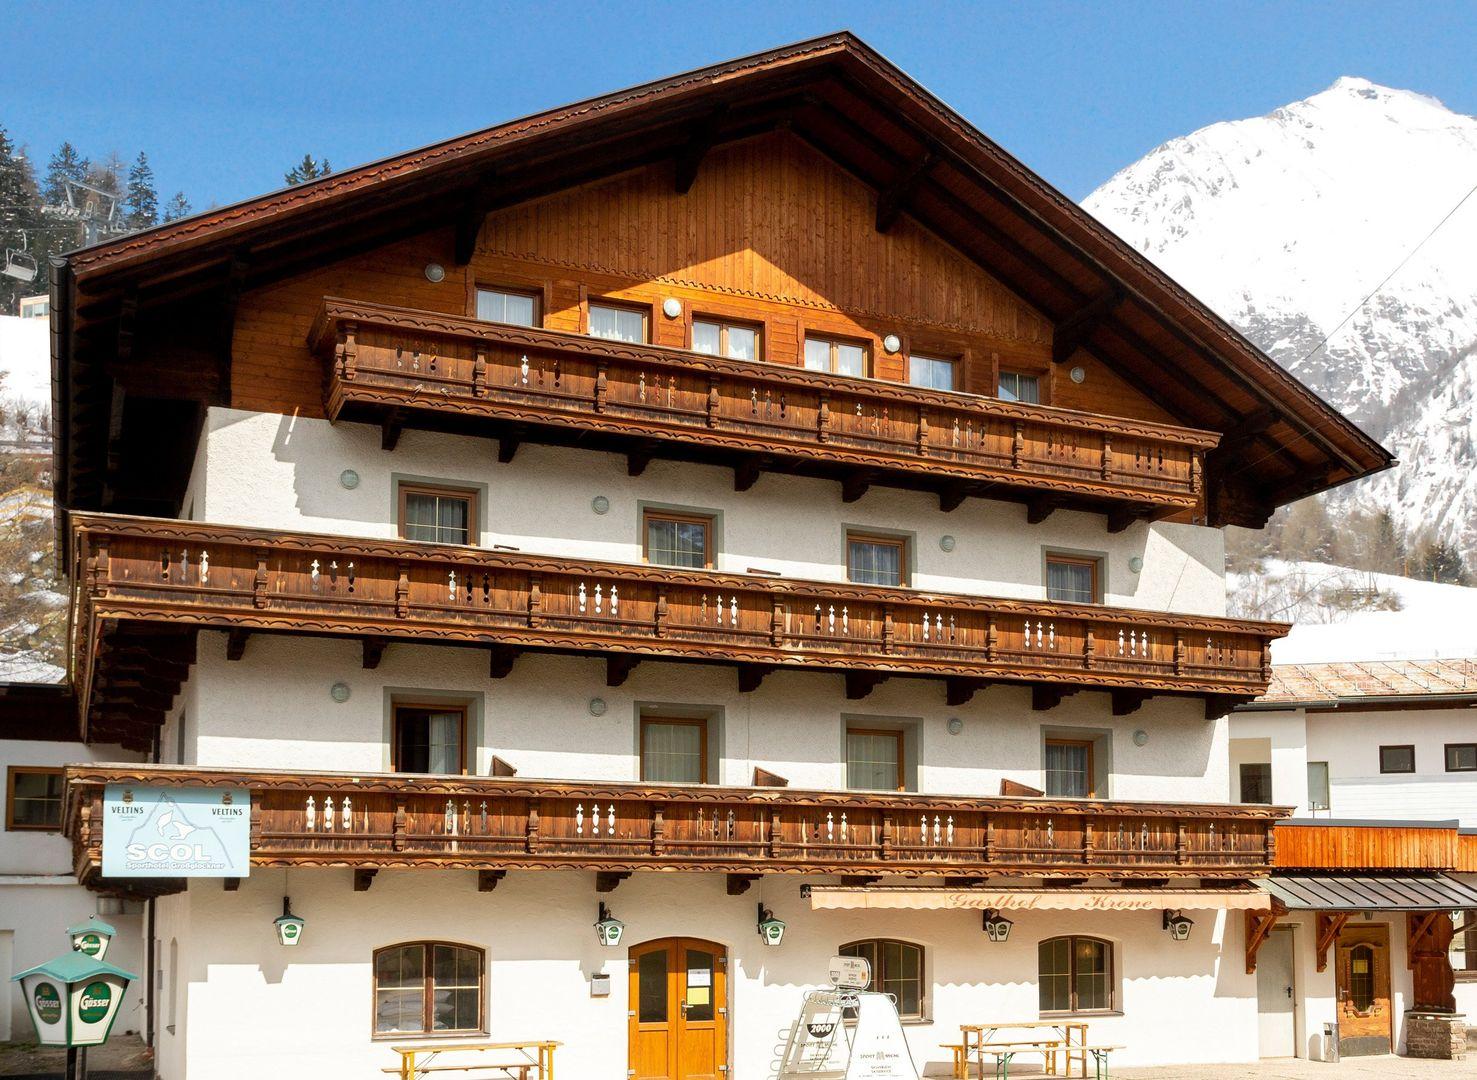 Alpenhof Kals - Slide 1